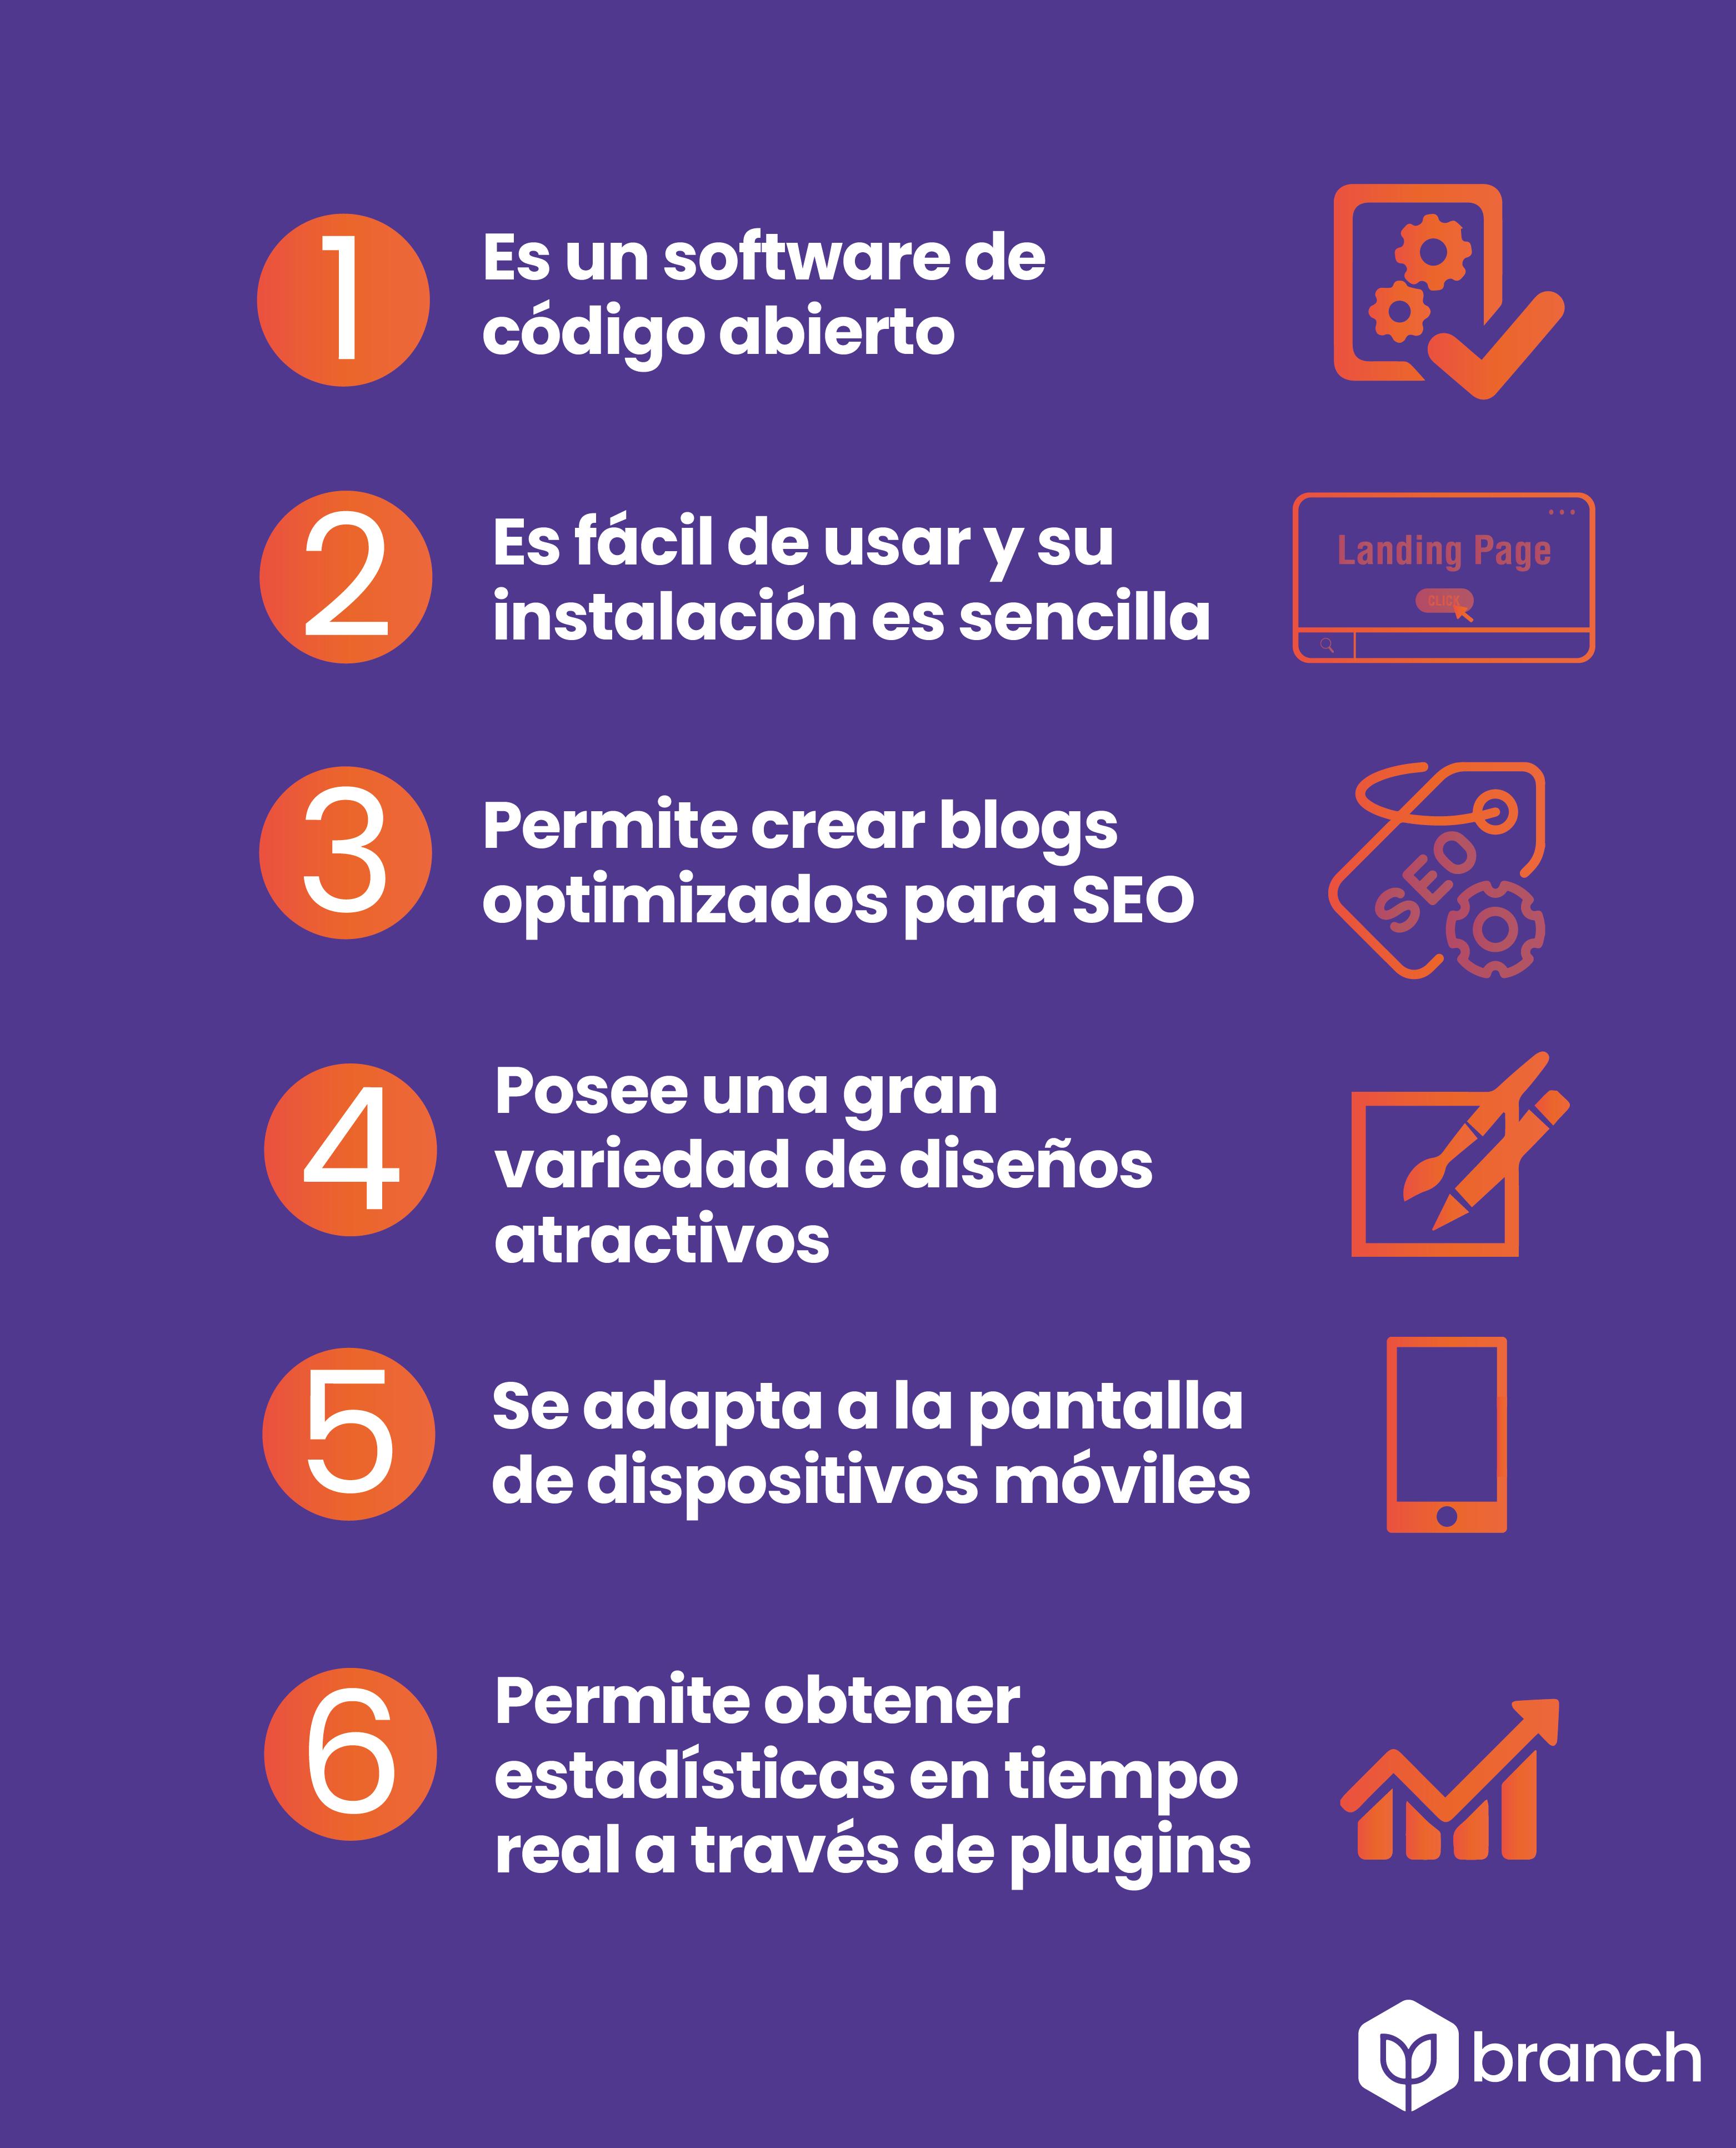 infografia-6-ventajas-de-usar-wordpress